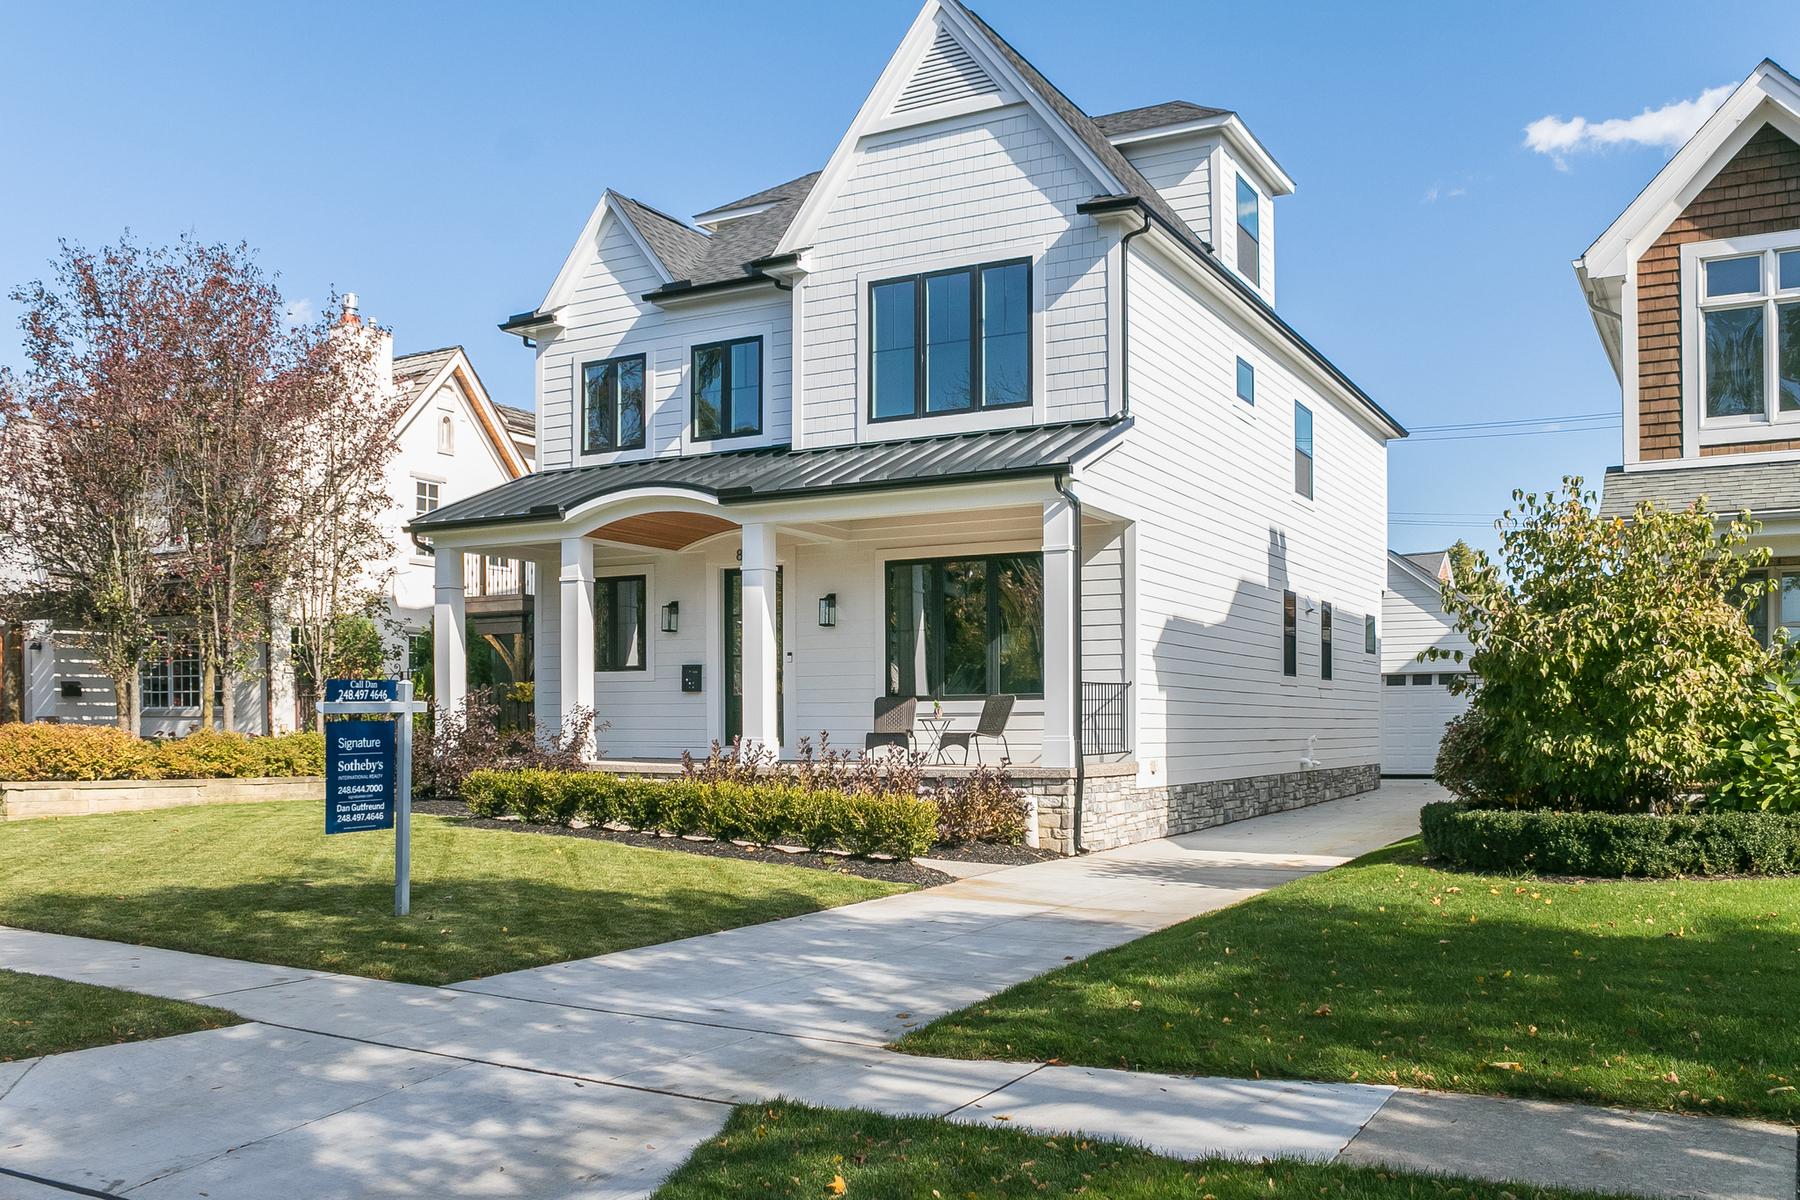 Single Family Homes for Active at Birmingham 863 S Bates Birmingham, Michigan 48009 United States